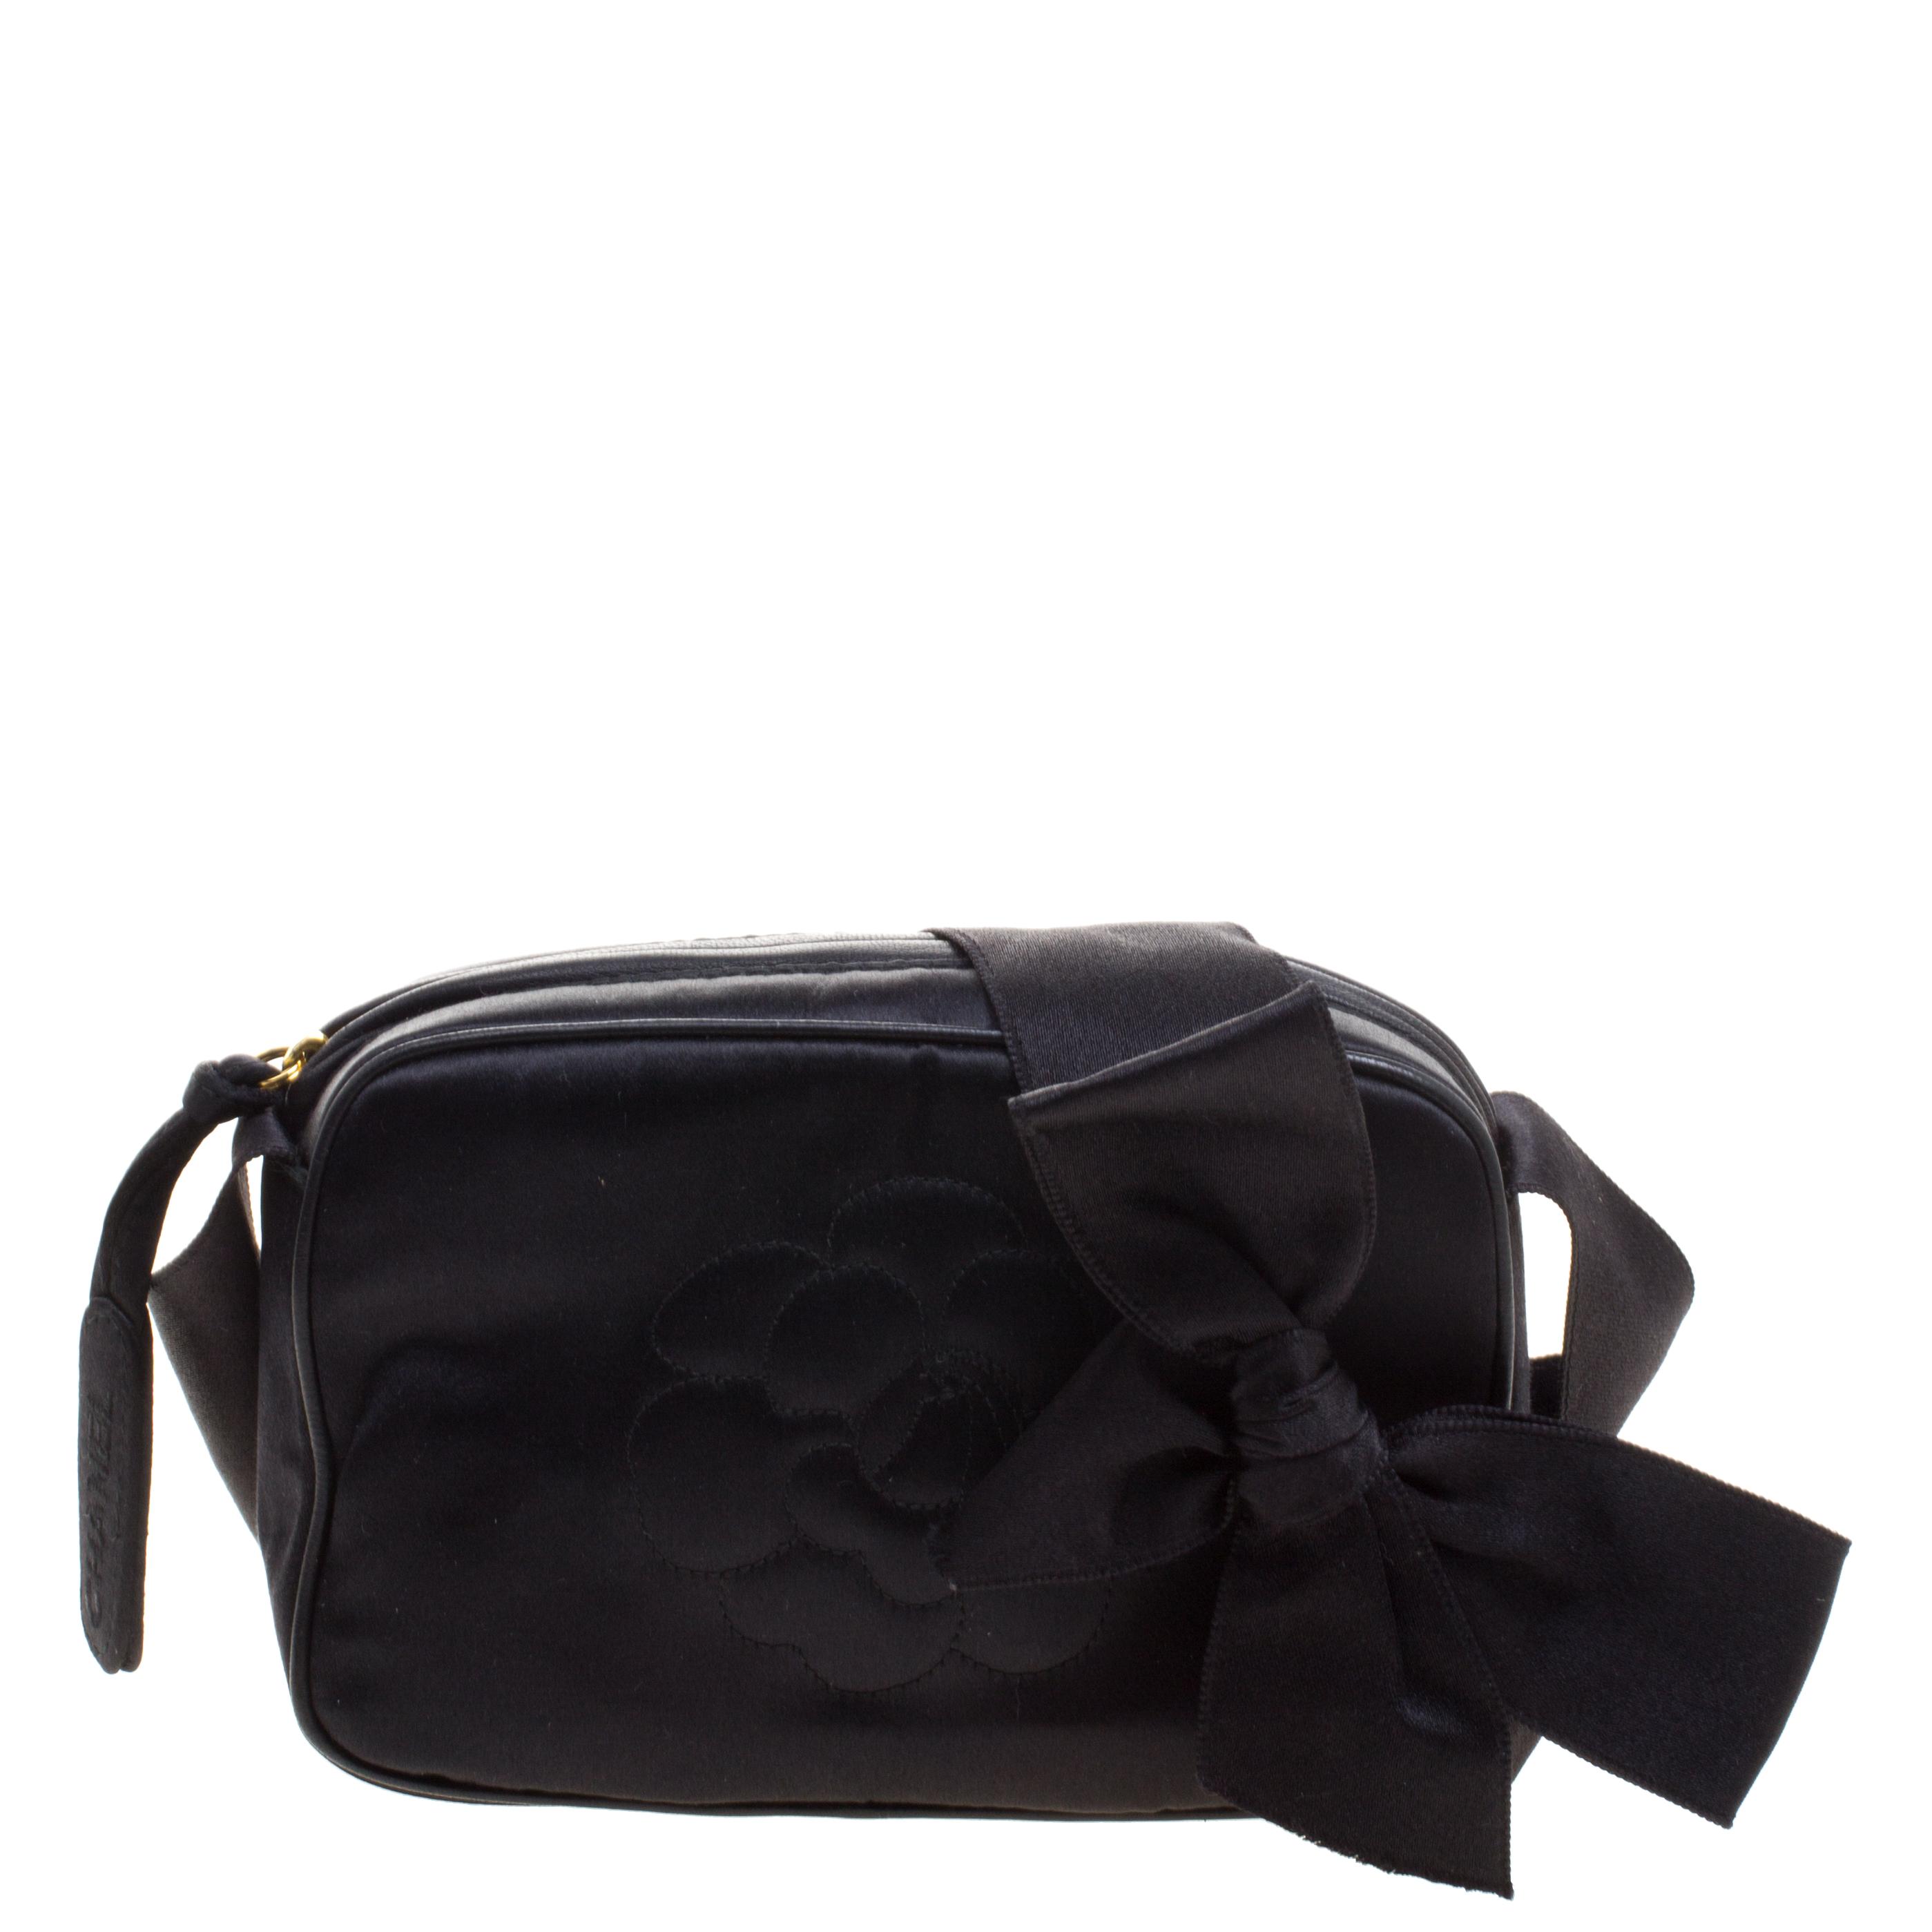 ... Chanel Black Satin Bow Camellia Crossbody Bag. nextprev. prevnext 35fbbcda57f20